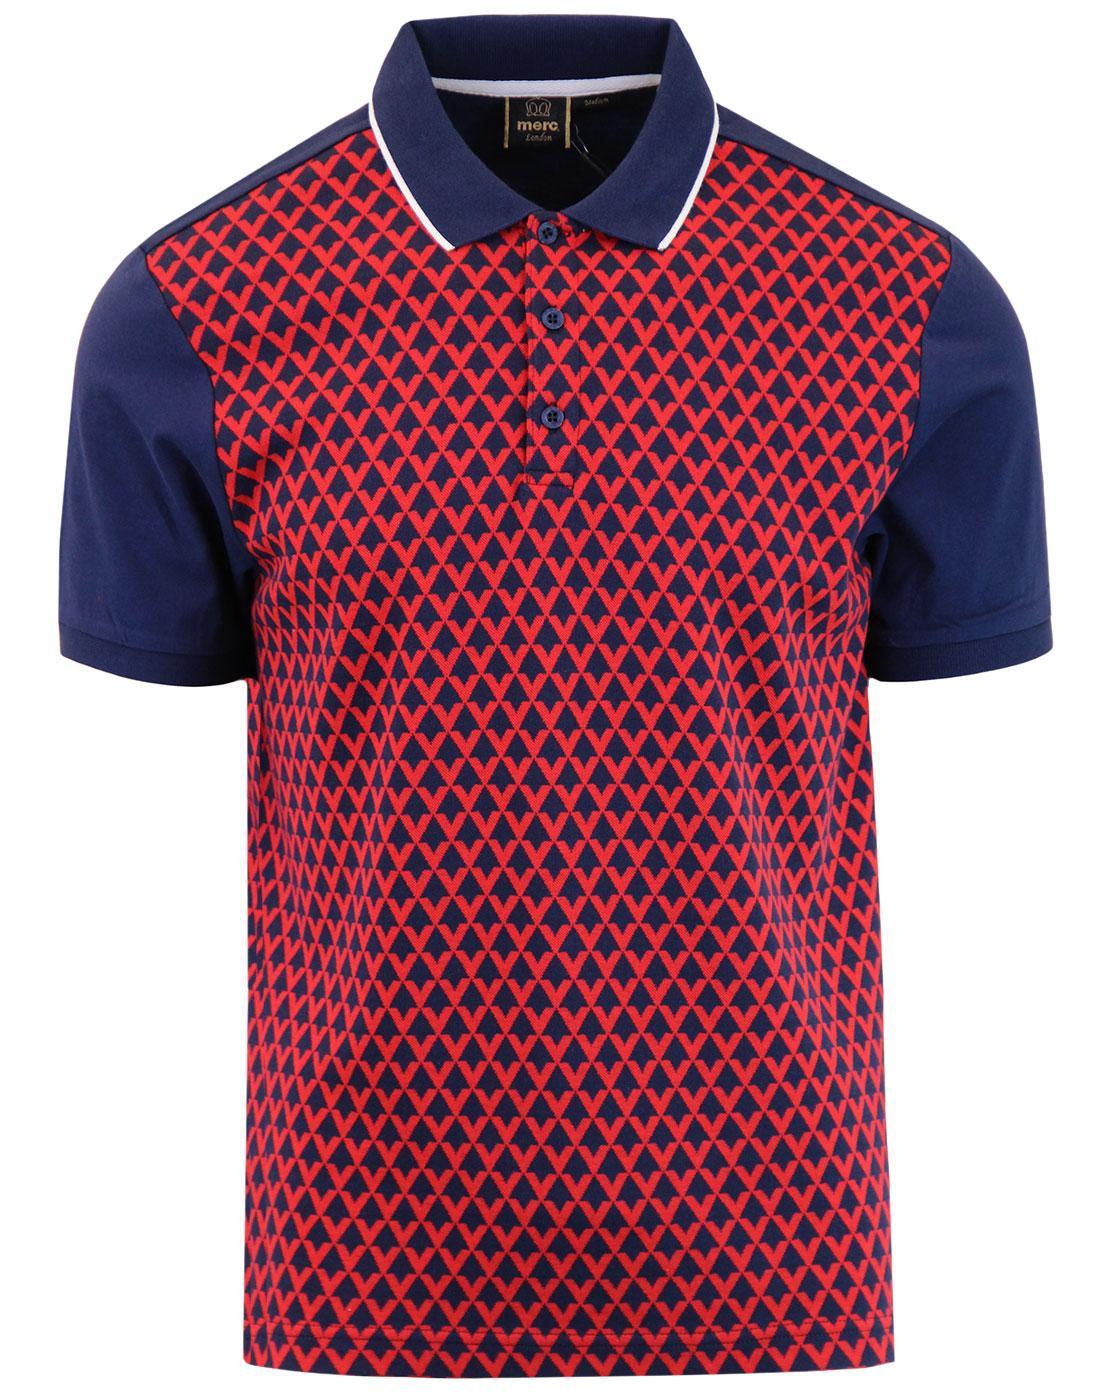 Gunner MERC 1960s Mod Diamond Jacquard Polo Shirt